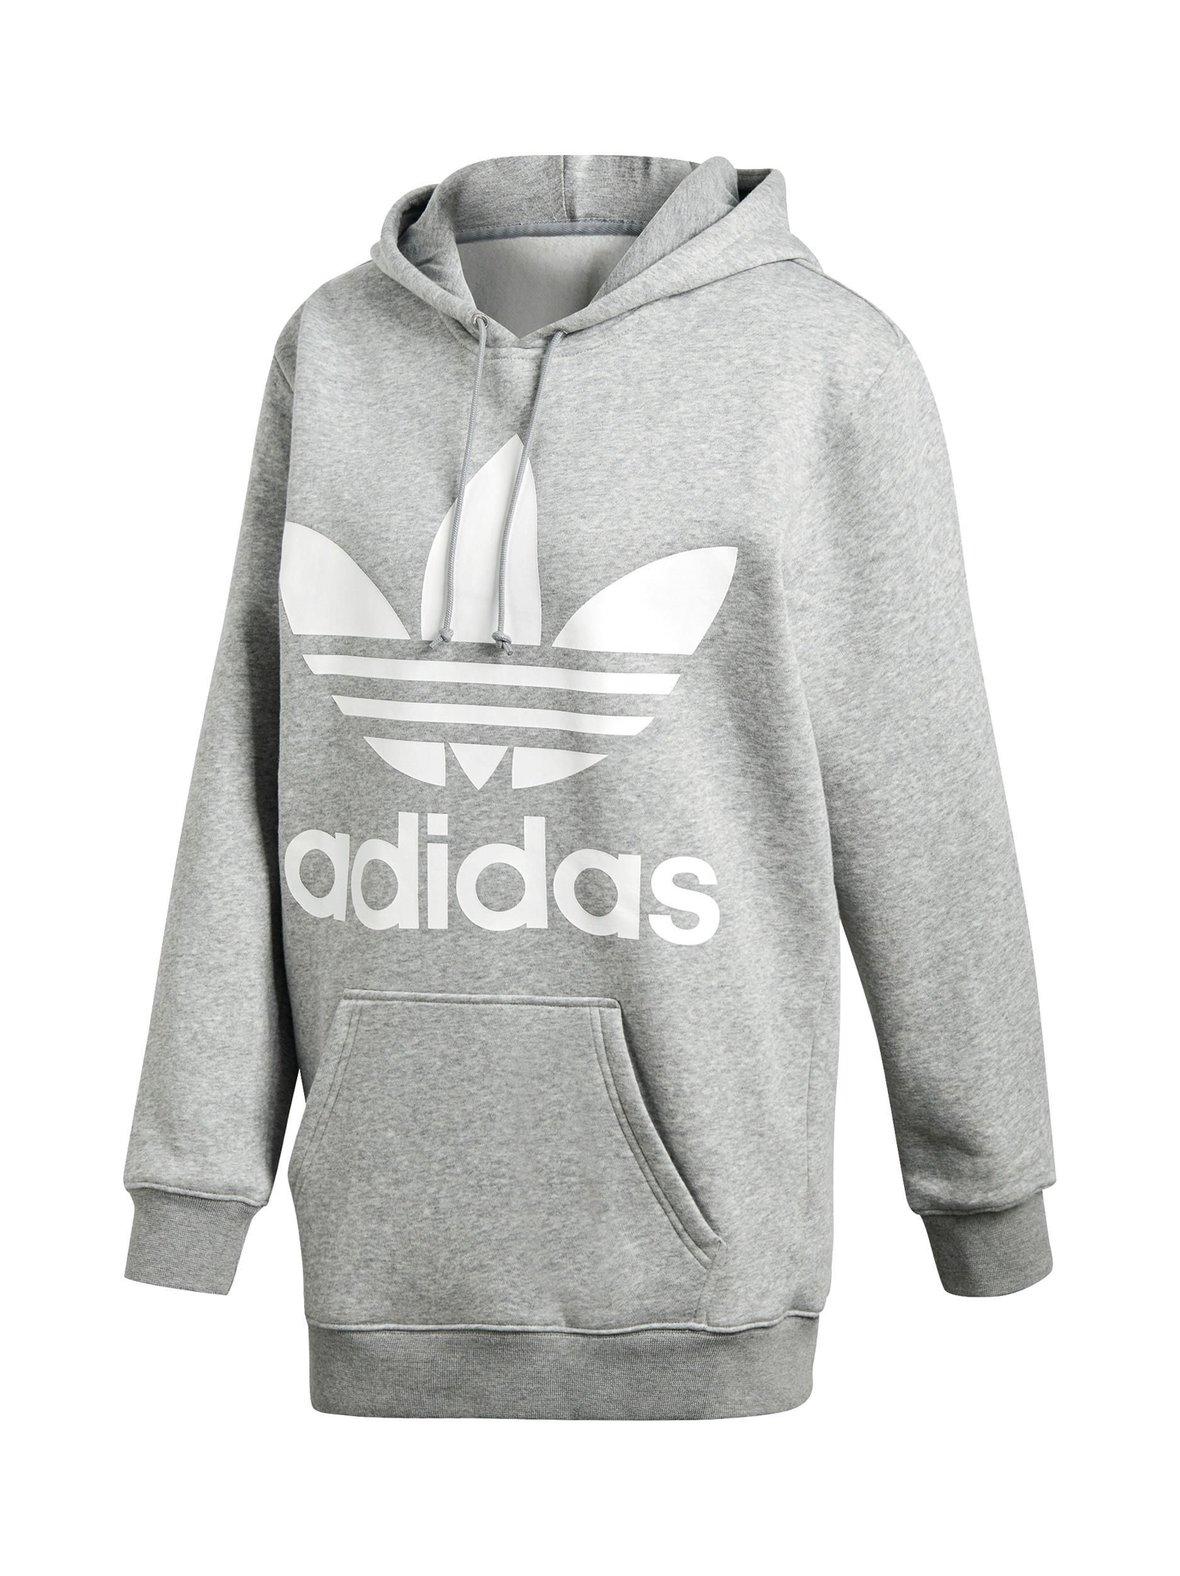 Medium Grey Heather (harmaa) Adidas Originals Trefoil Loose Fit ... eb2f301dfb